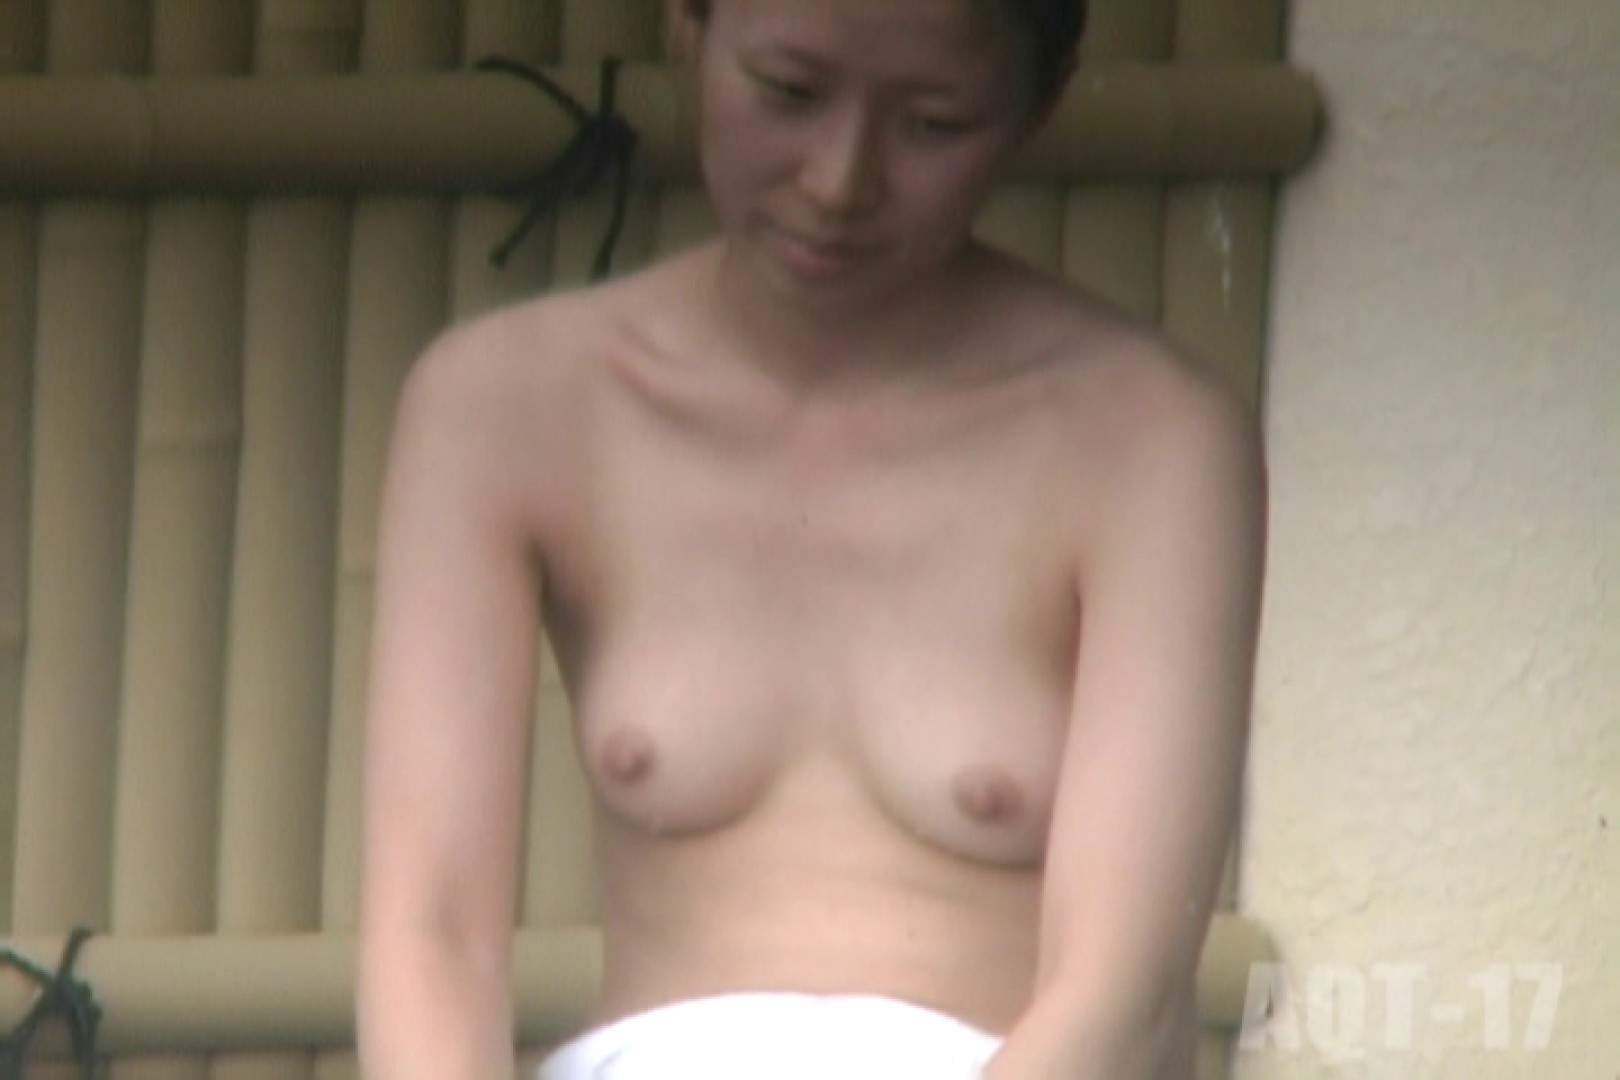 Aquaな露天風呂Vol.849 盗撮シリーズ   露天風呂編  75PIX 61